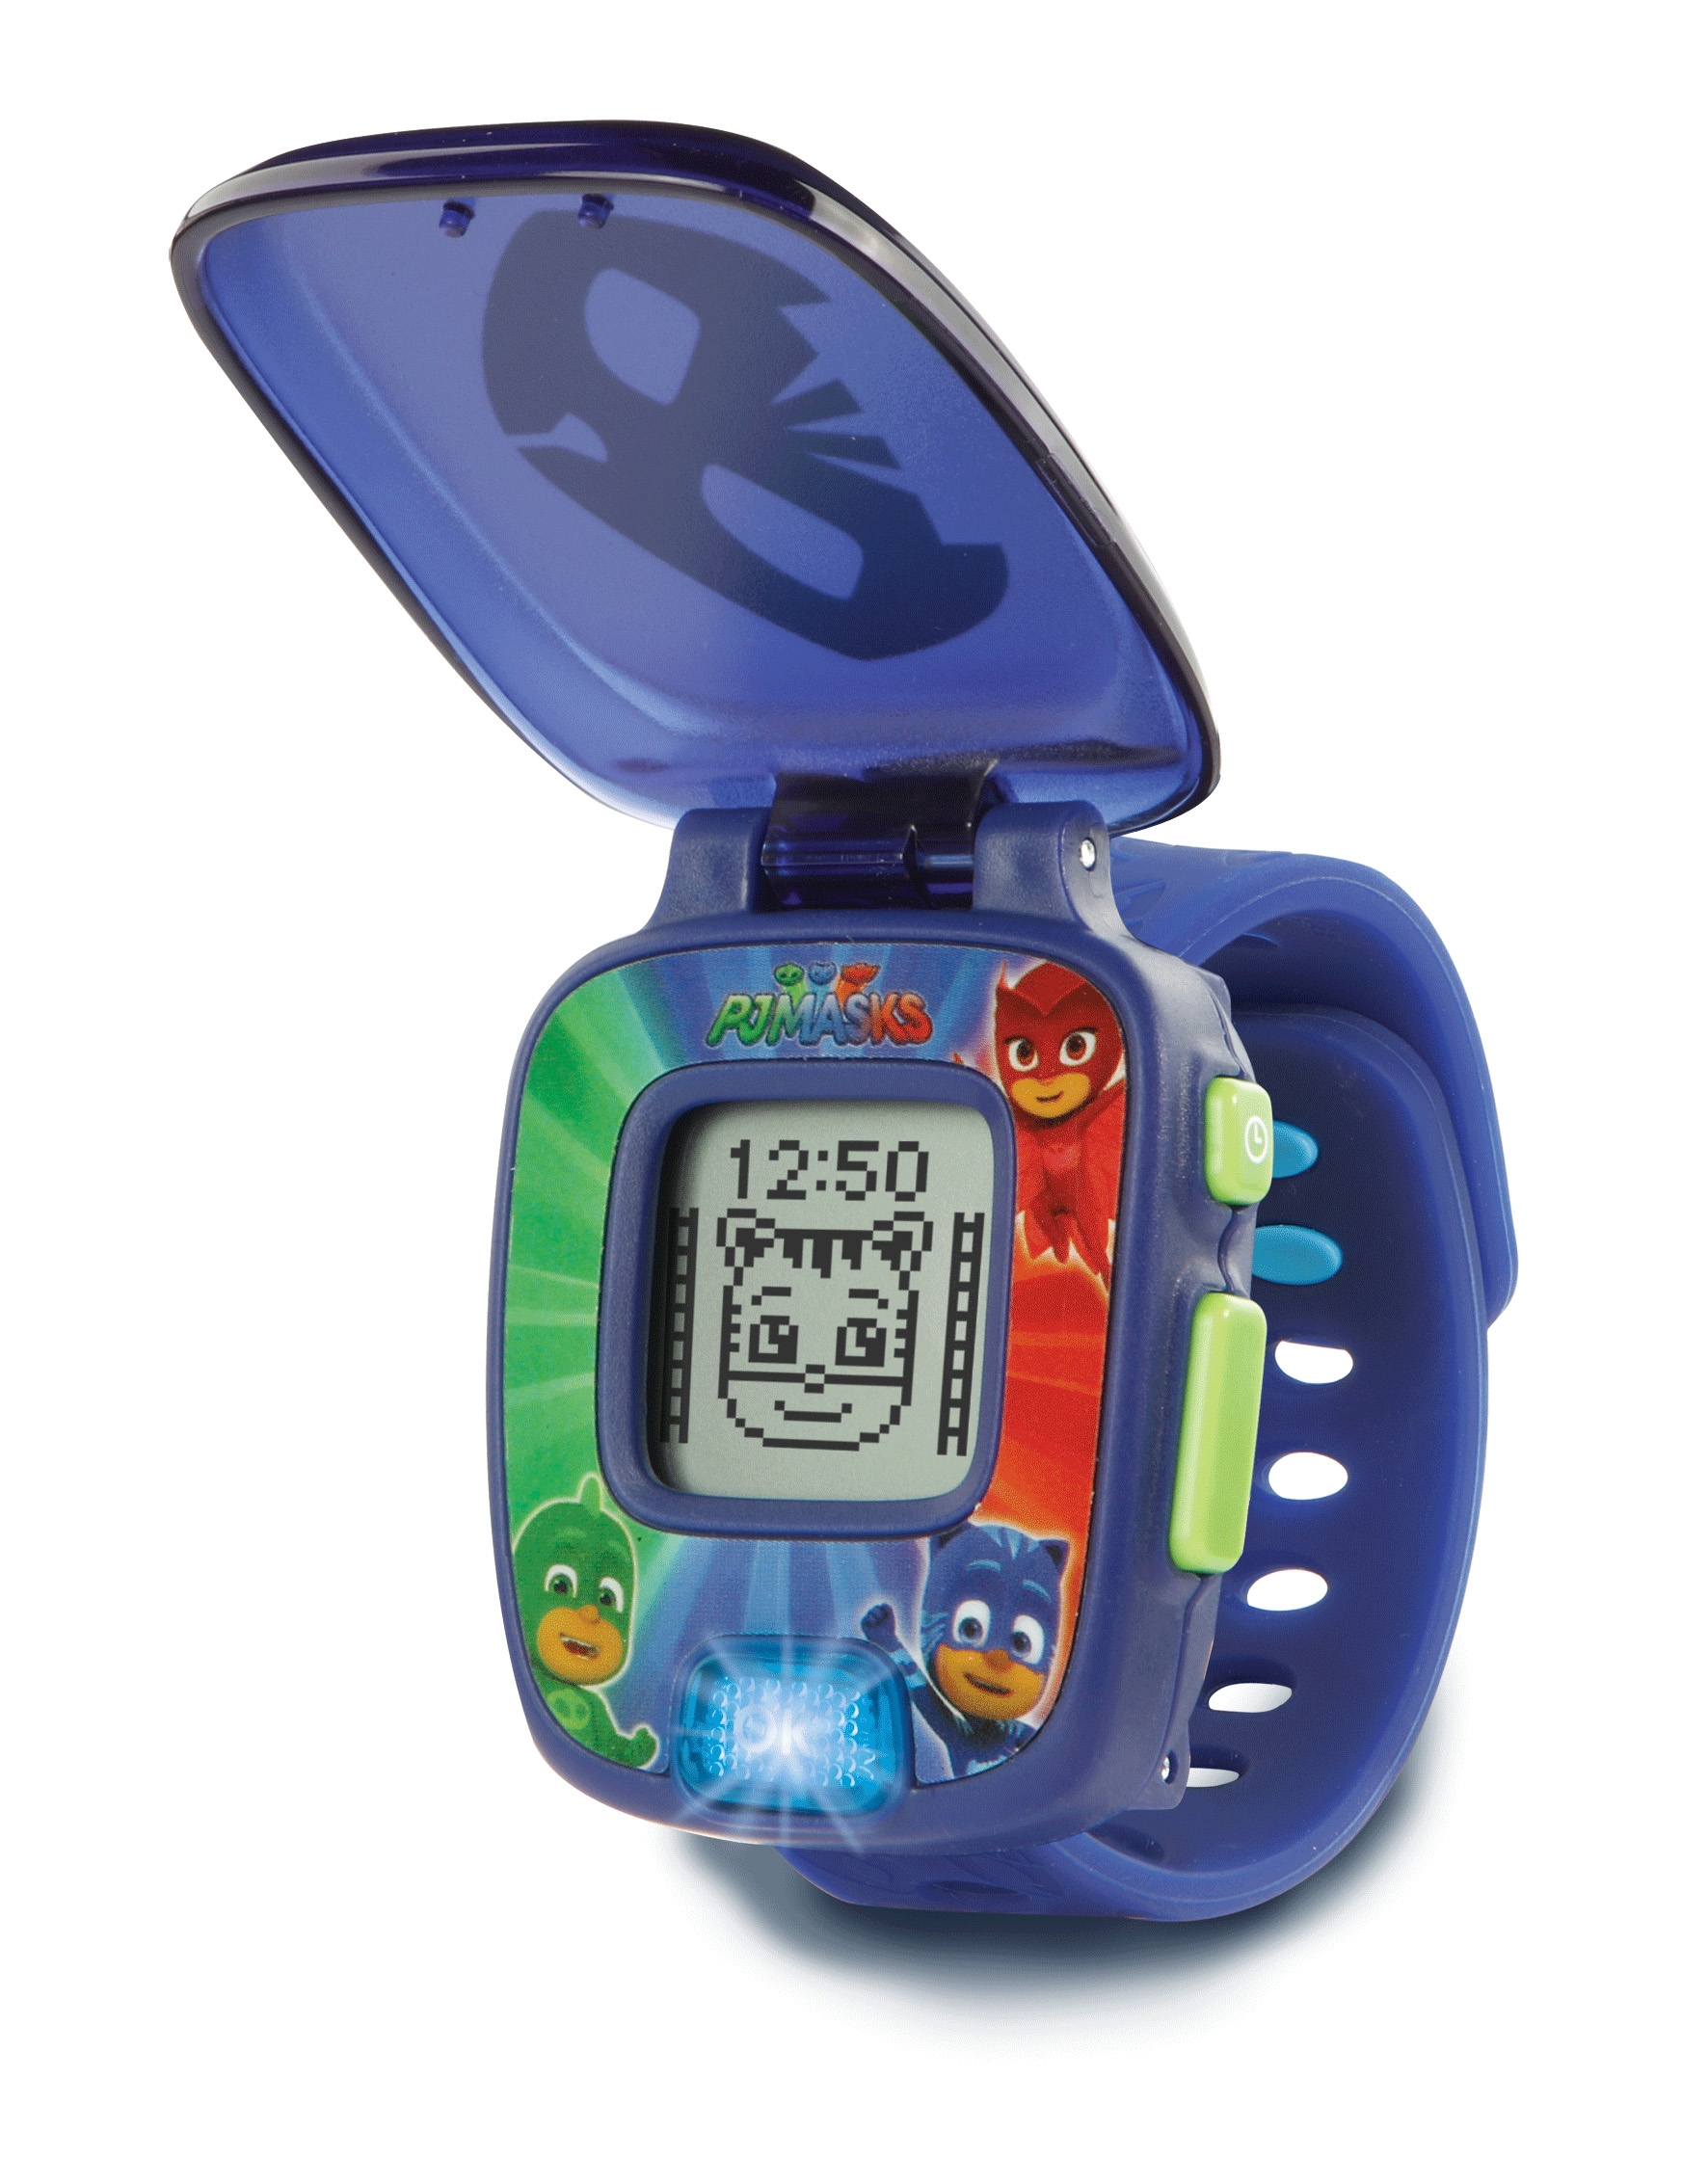 VTech PJ Masks - Catboy Learning Watch Ragazzo/Ragazza giocattolo educativo